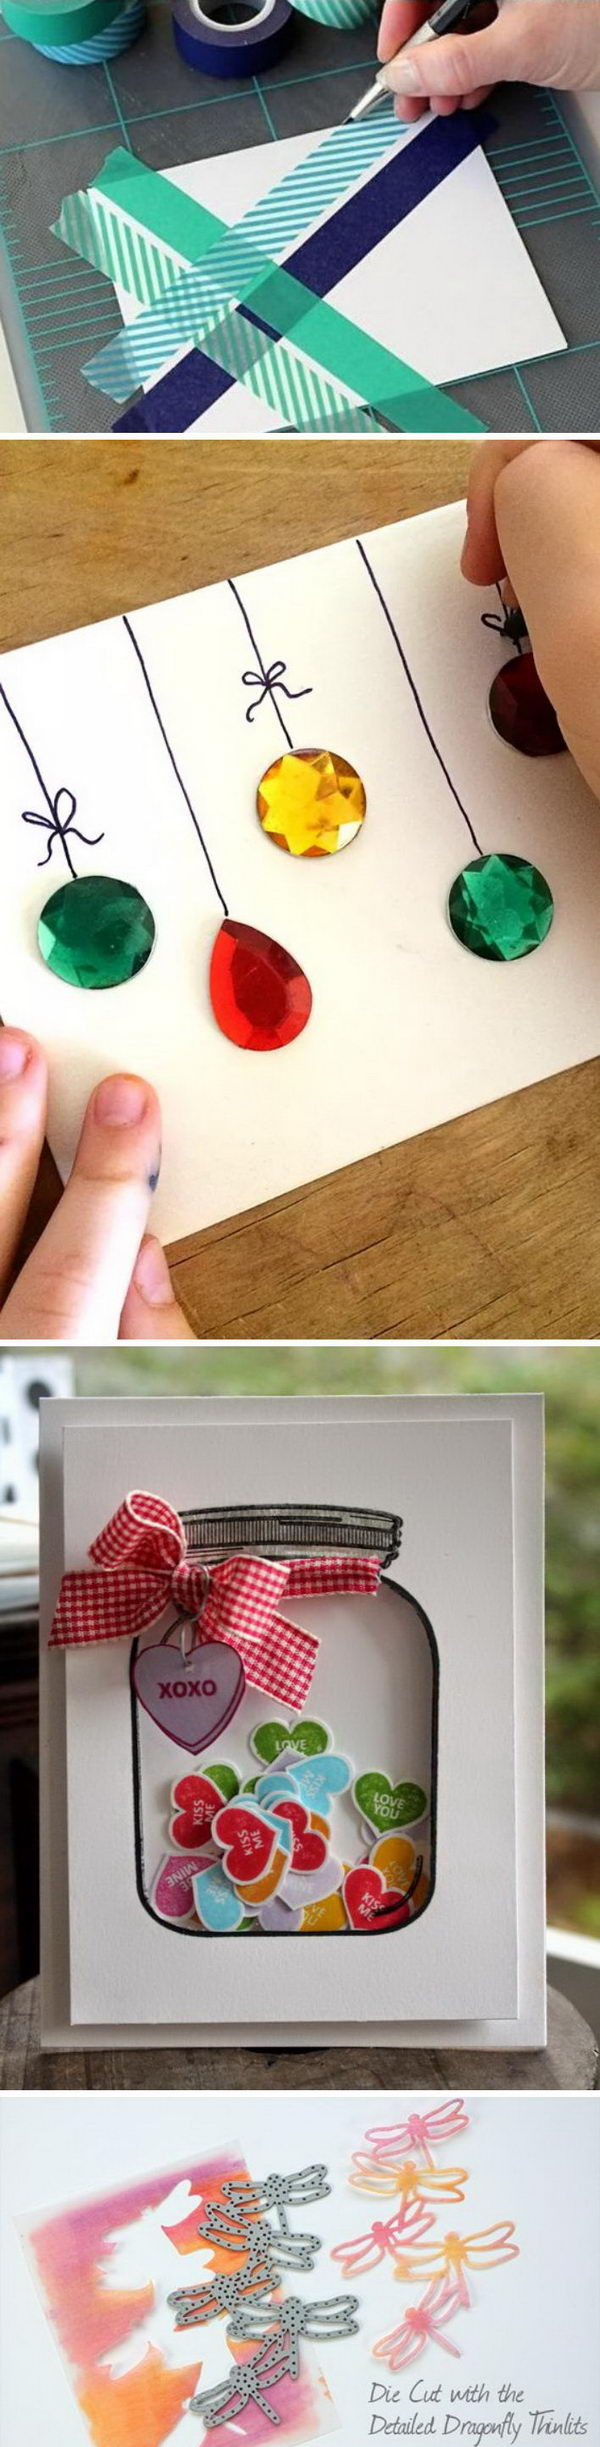 20 Handmade Card Ideas and Tutorials